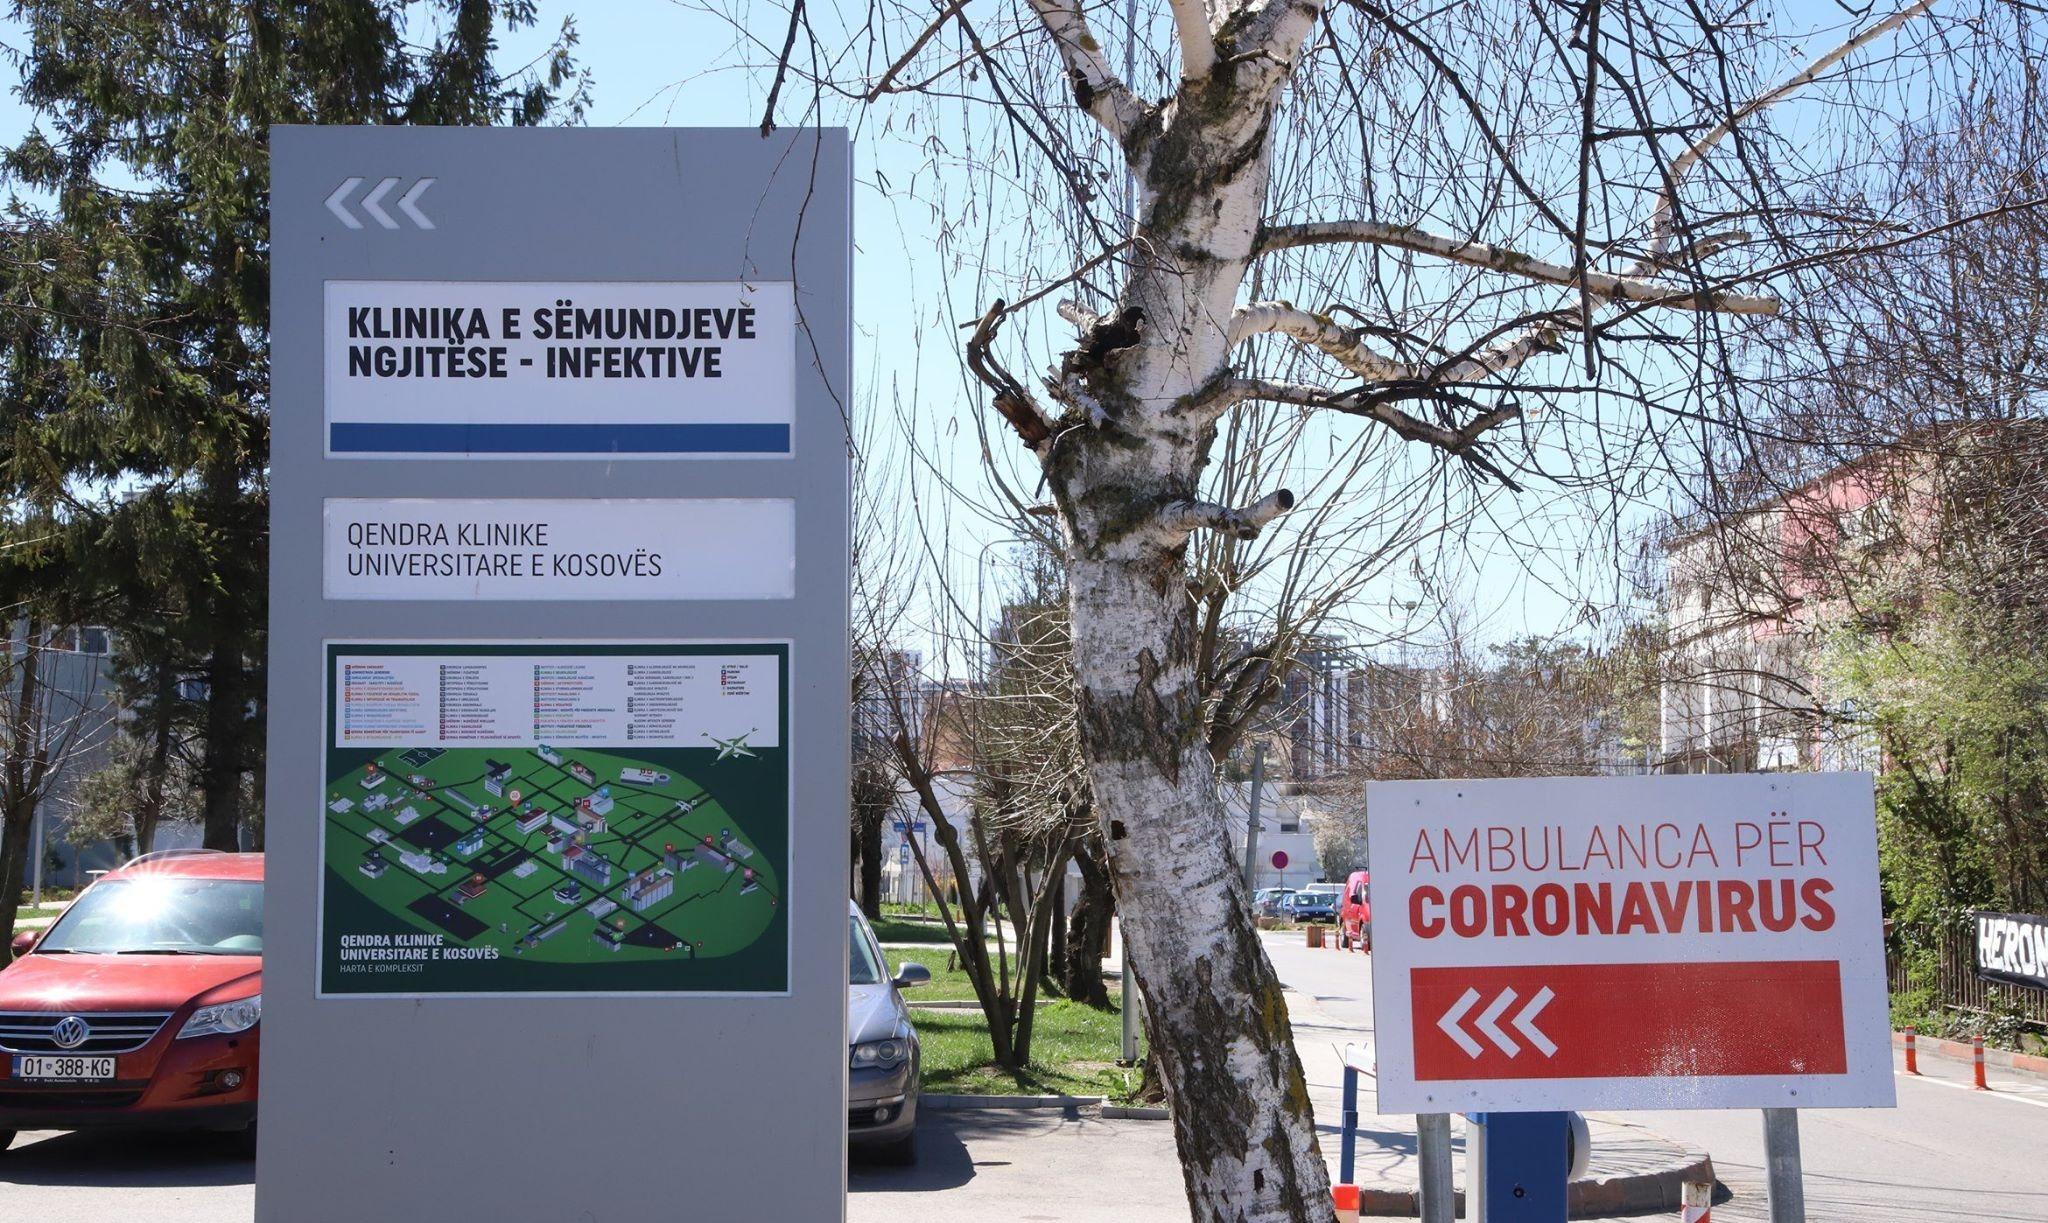 potvrdena-treca-zrtva-korona-virusa-danas-na-kosovu